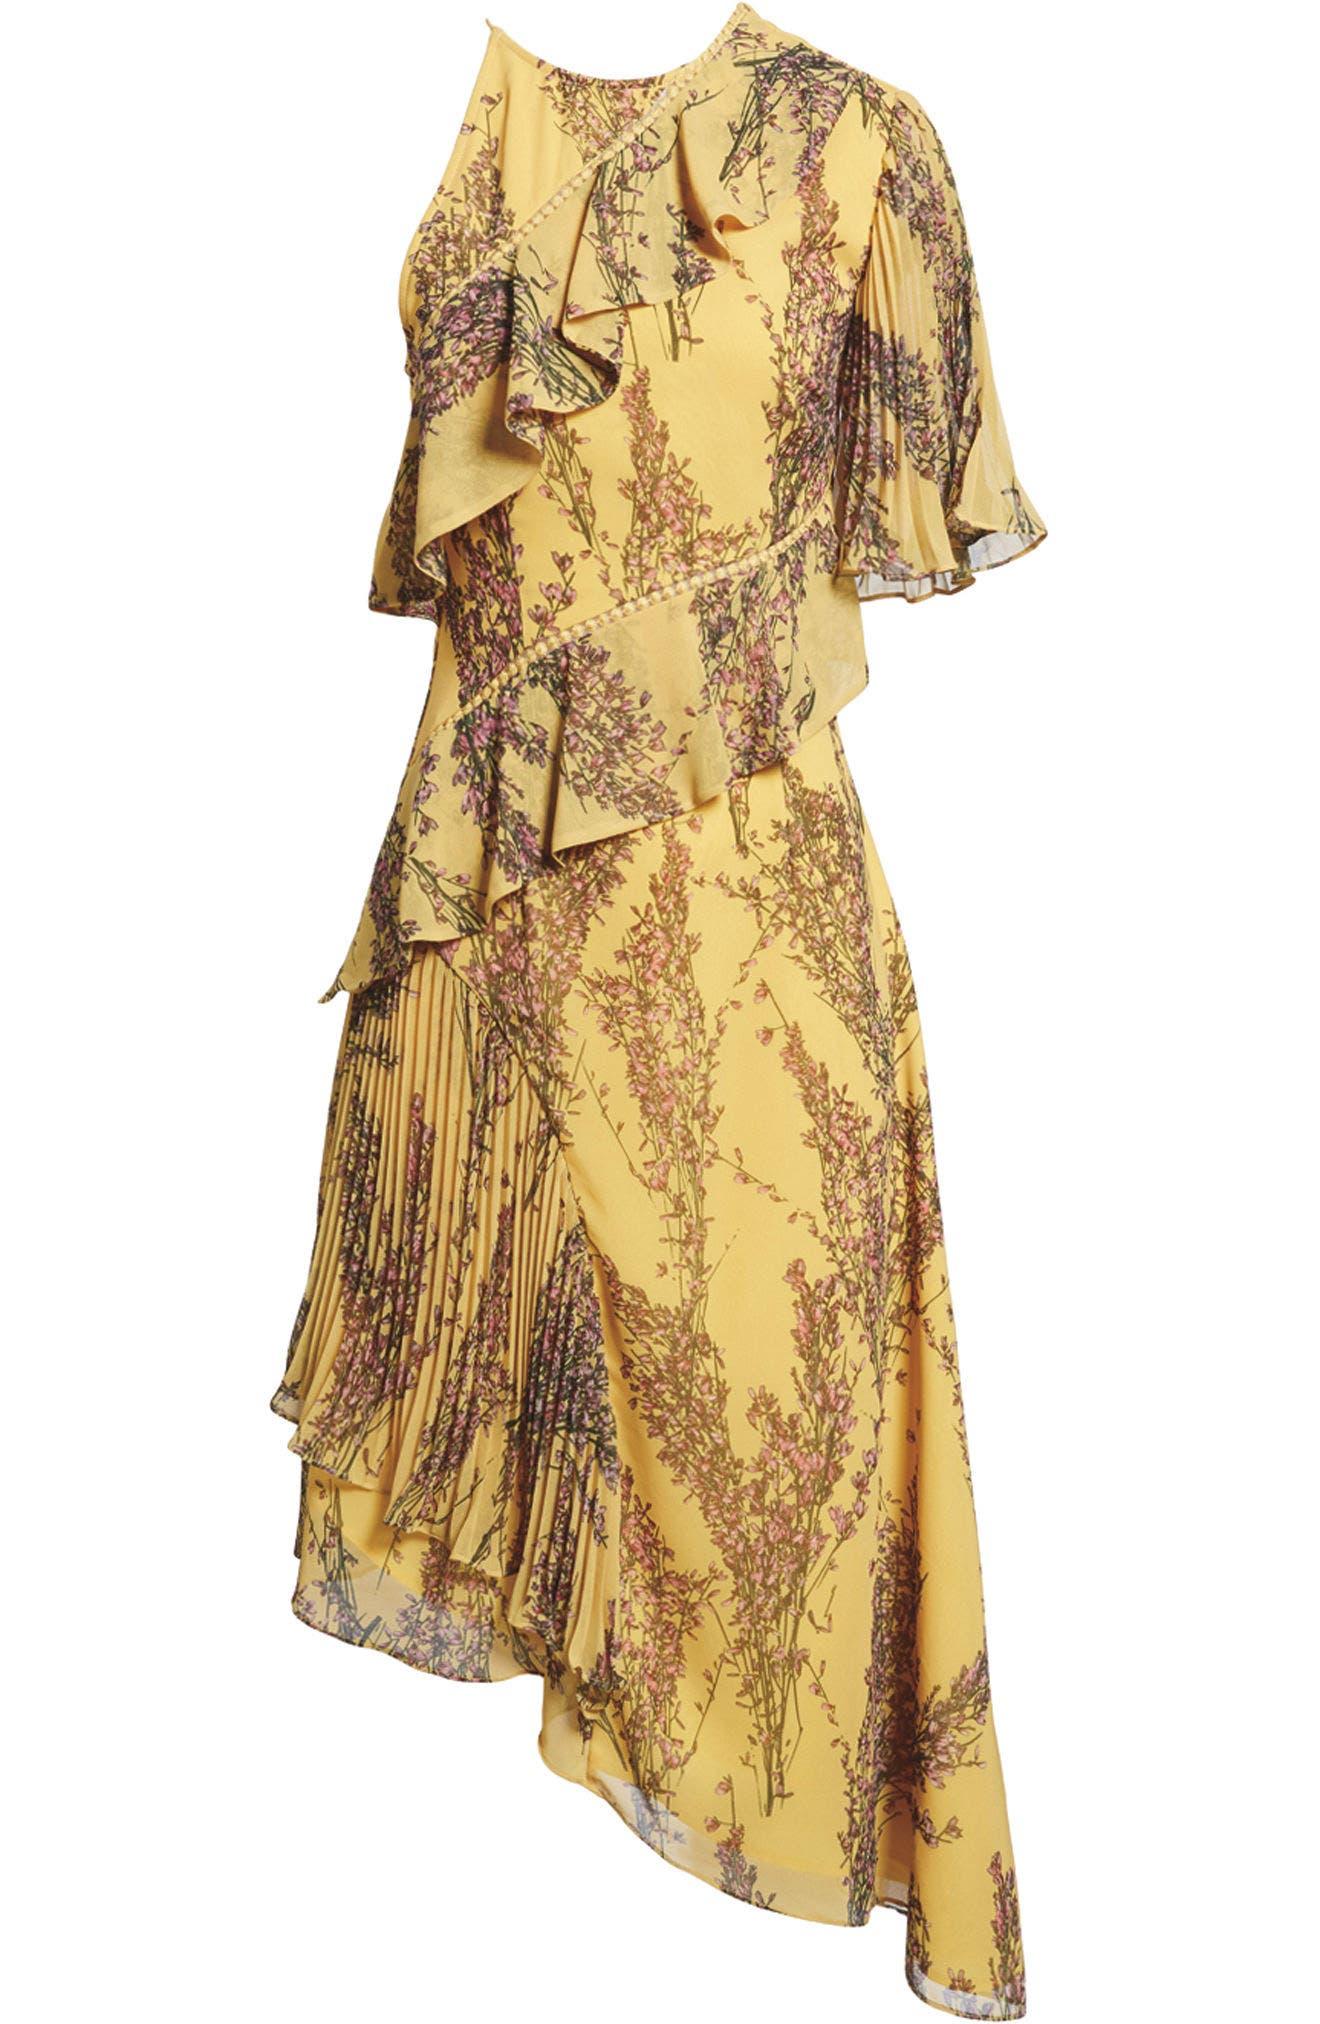 Asymmetrical Ruffle Dress,                             Alternate thumbnail 12, color,                             622